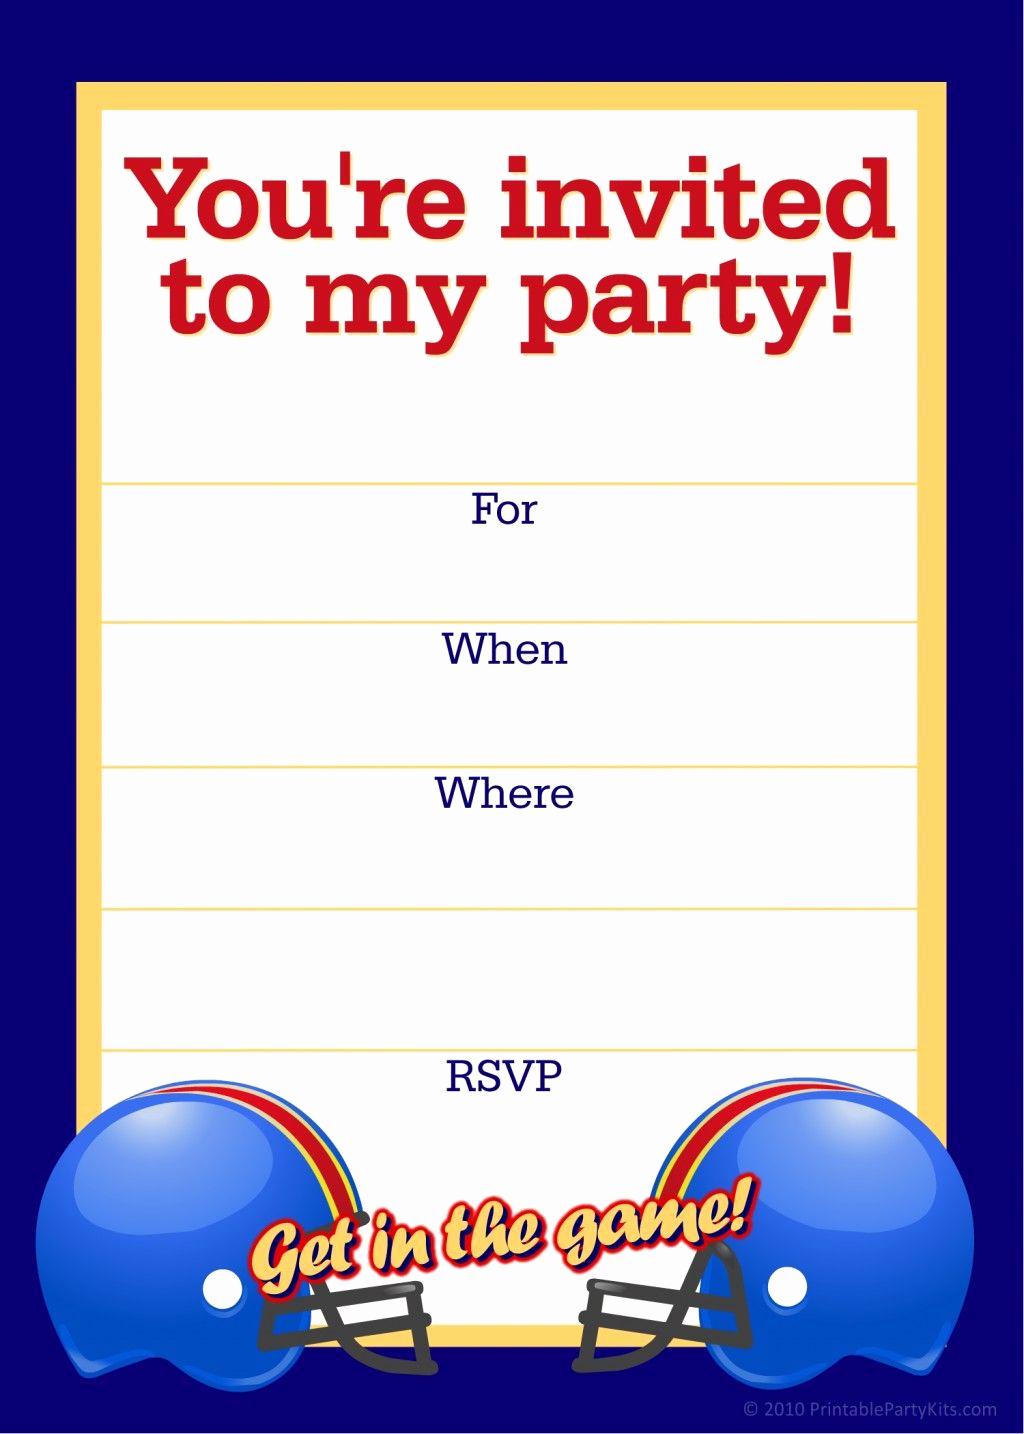 Free Printable Birthday Invitation Templates Unique Free Printable Sports Birthday Party Invitations Templates